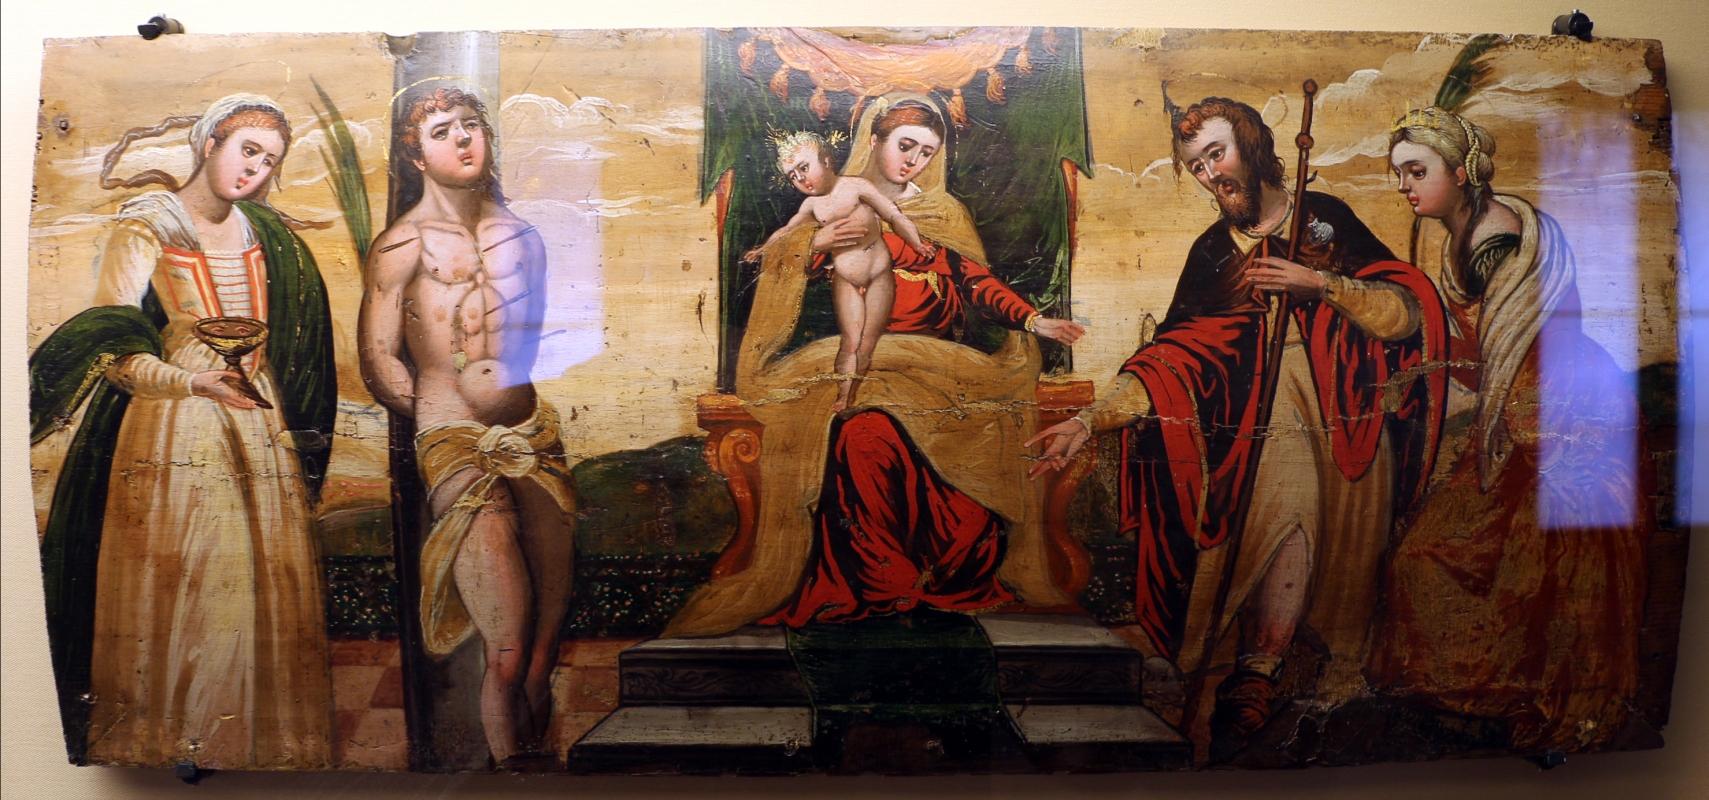 Scuola cretese, madonna in trono tra santi, 1610 ca - Sailko - Ravenna (RA)